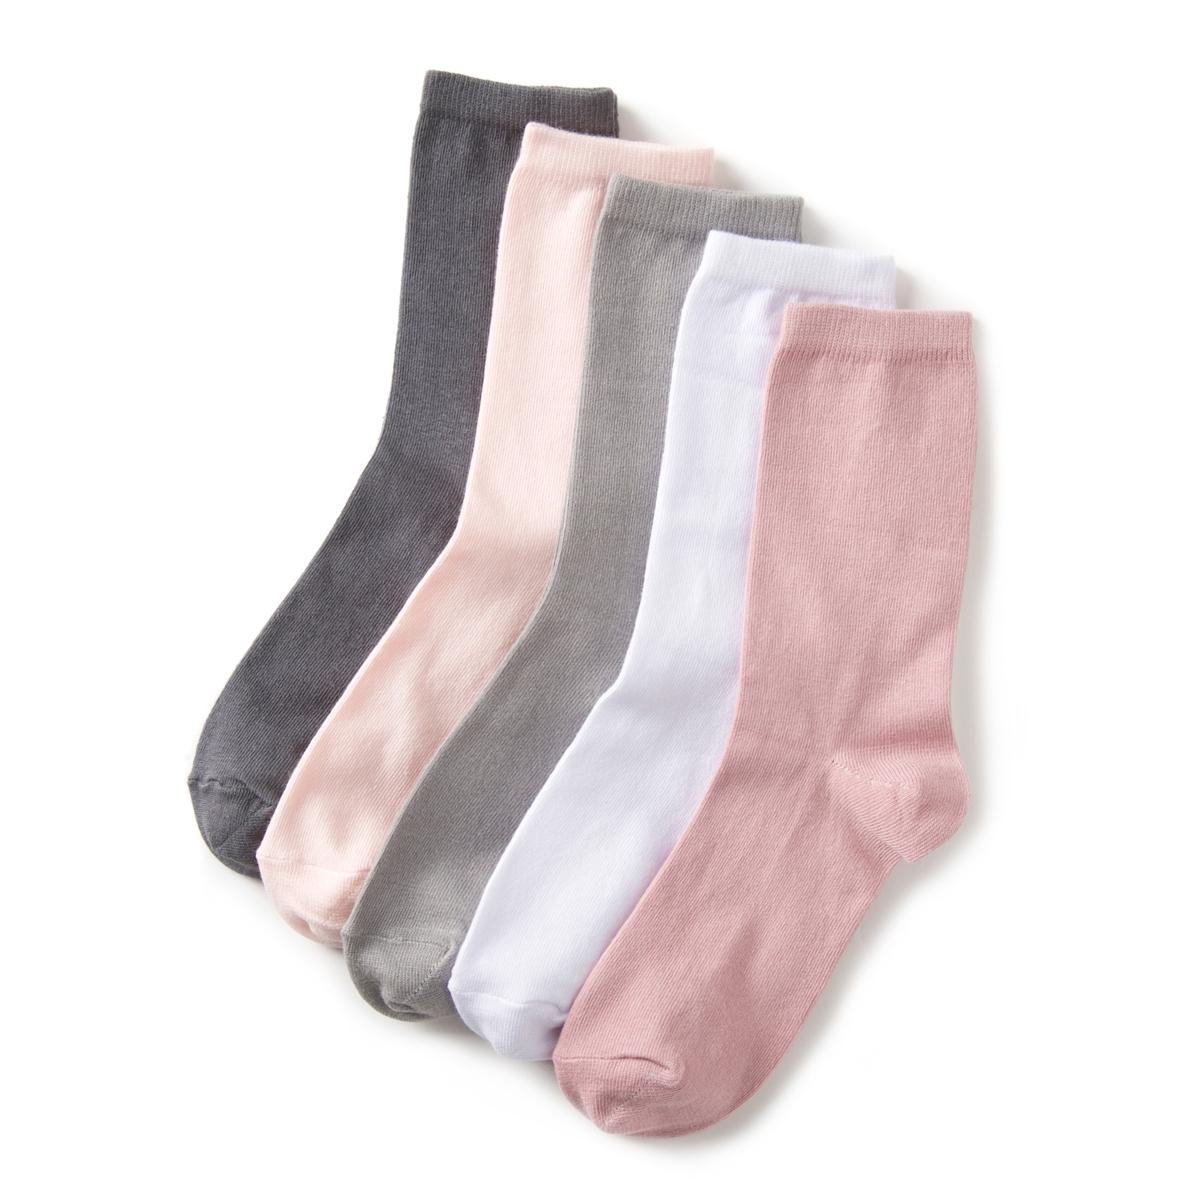 Комплект из 5 пар однотонных носков комплект из 4 пар носков размеры 15 18 23 26